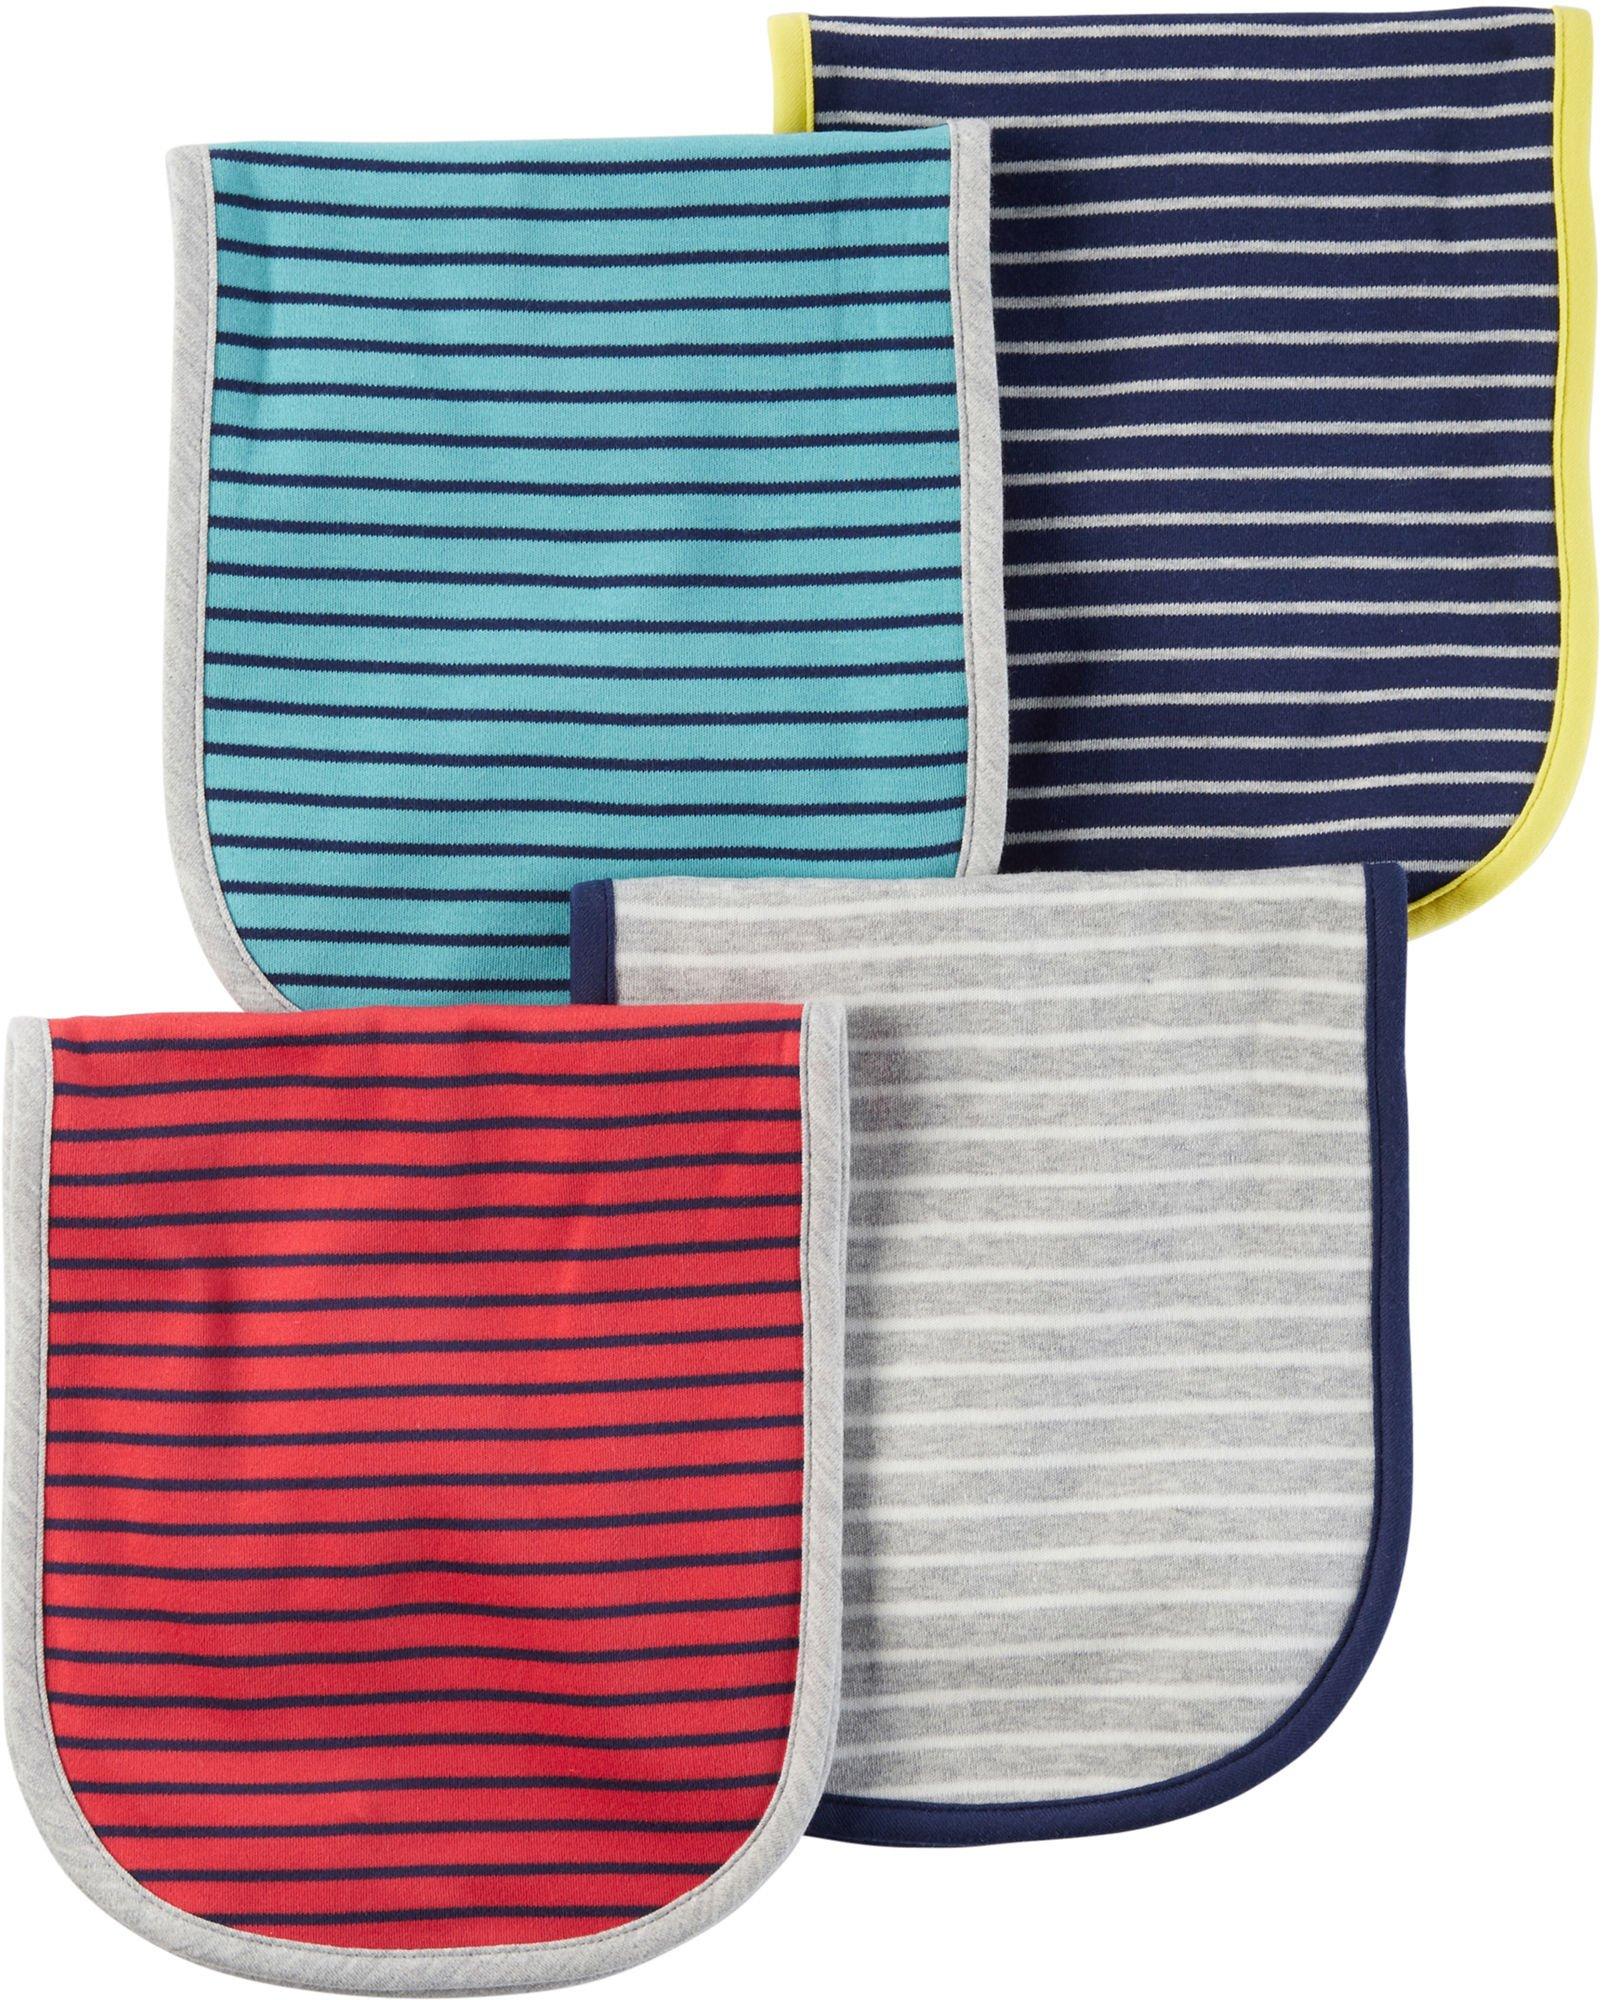 Carter's Baby Boys' 4-Pack Striped Burp Cloths